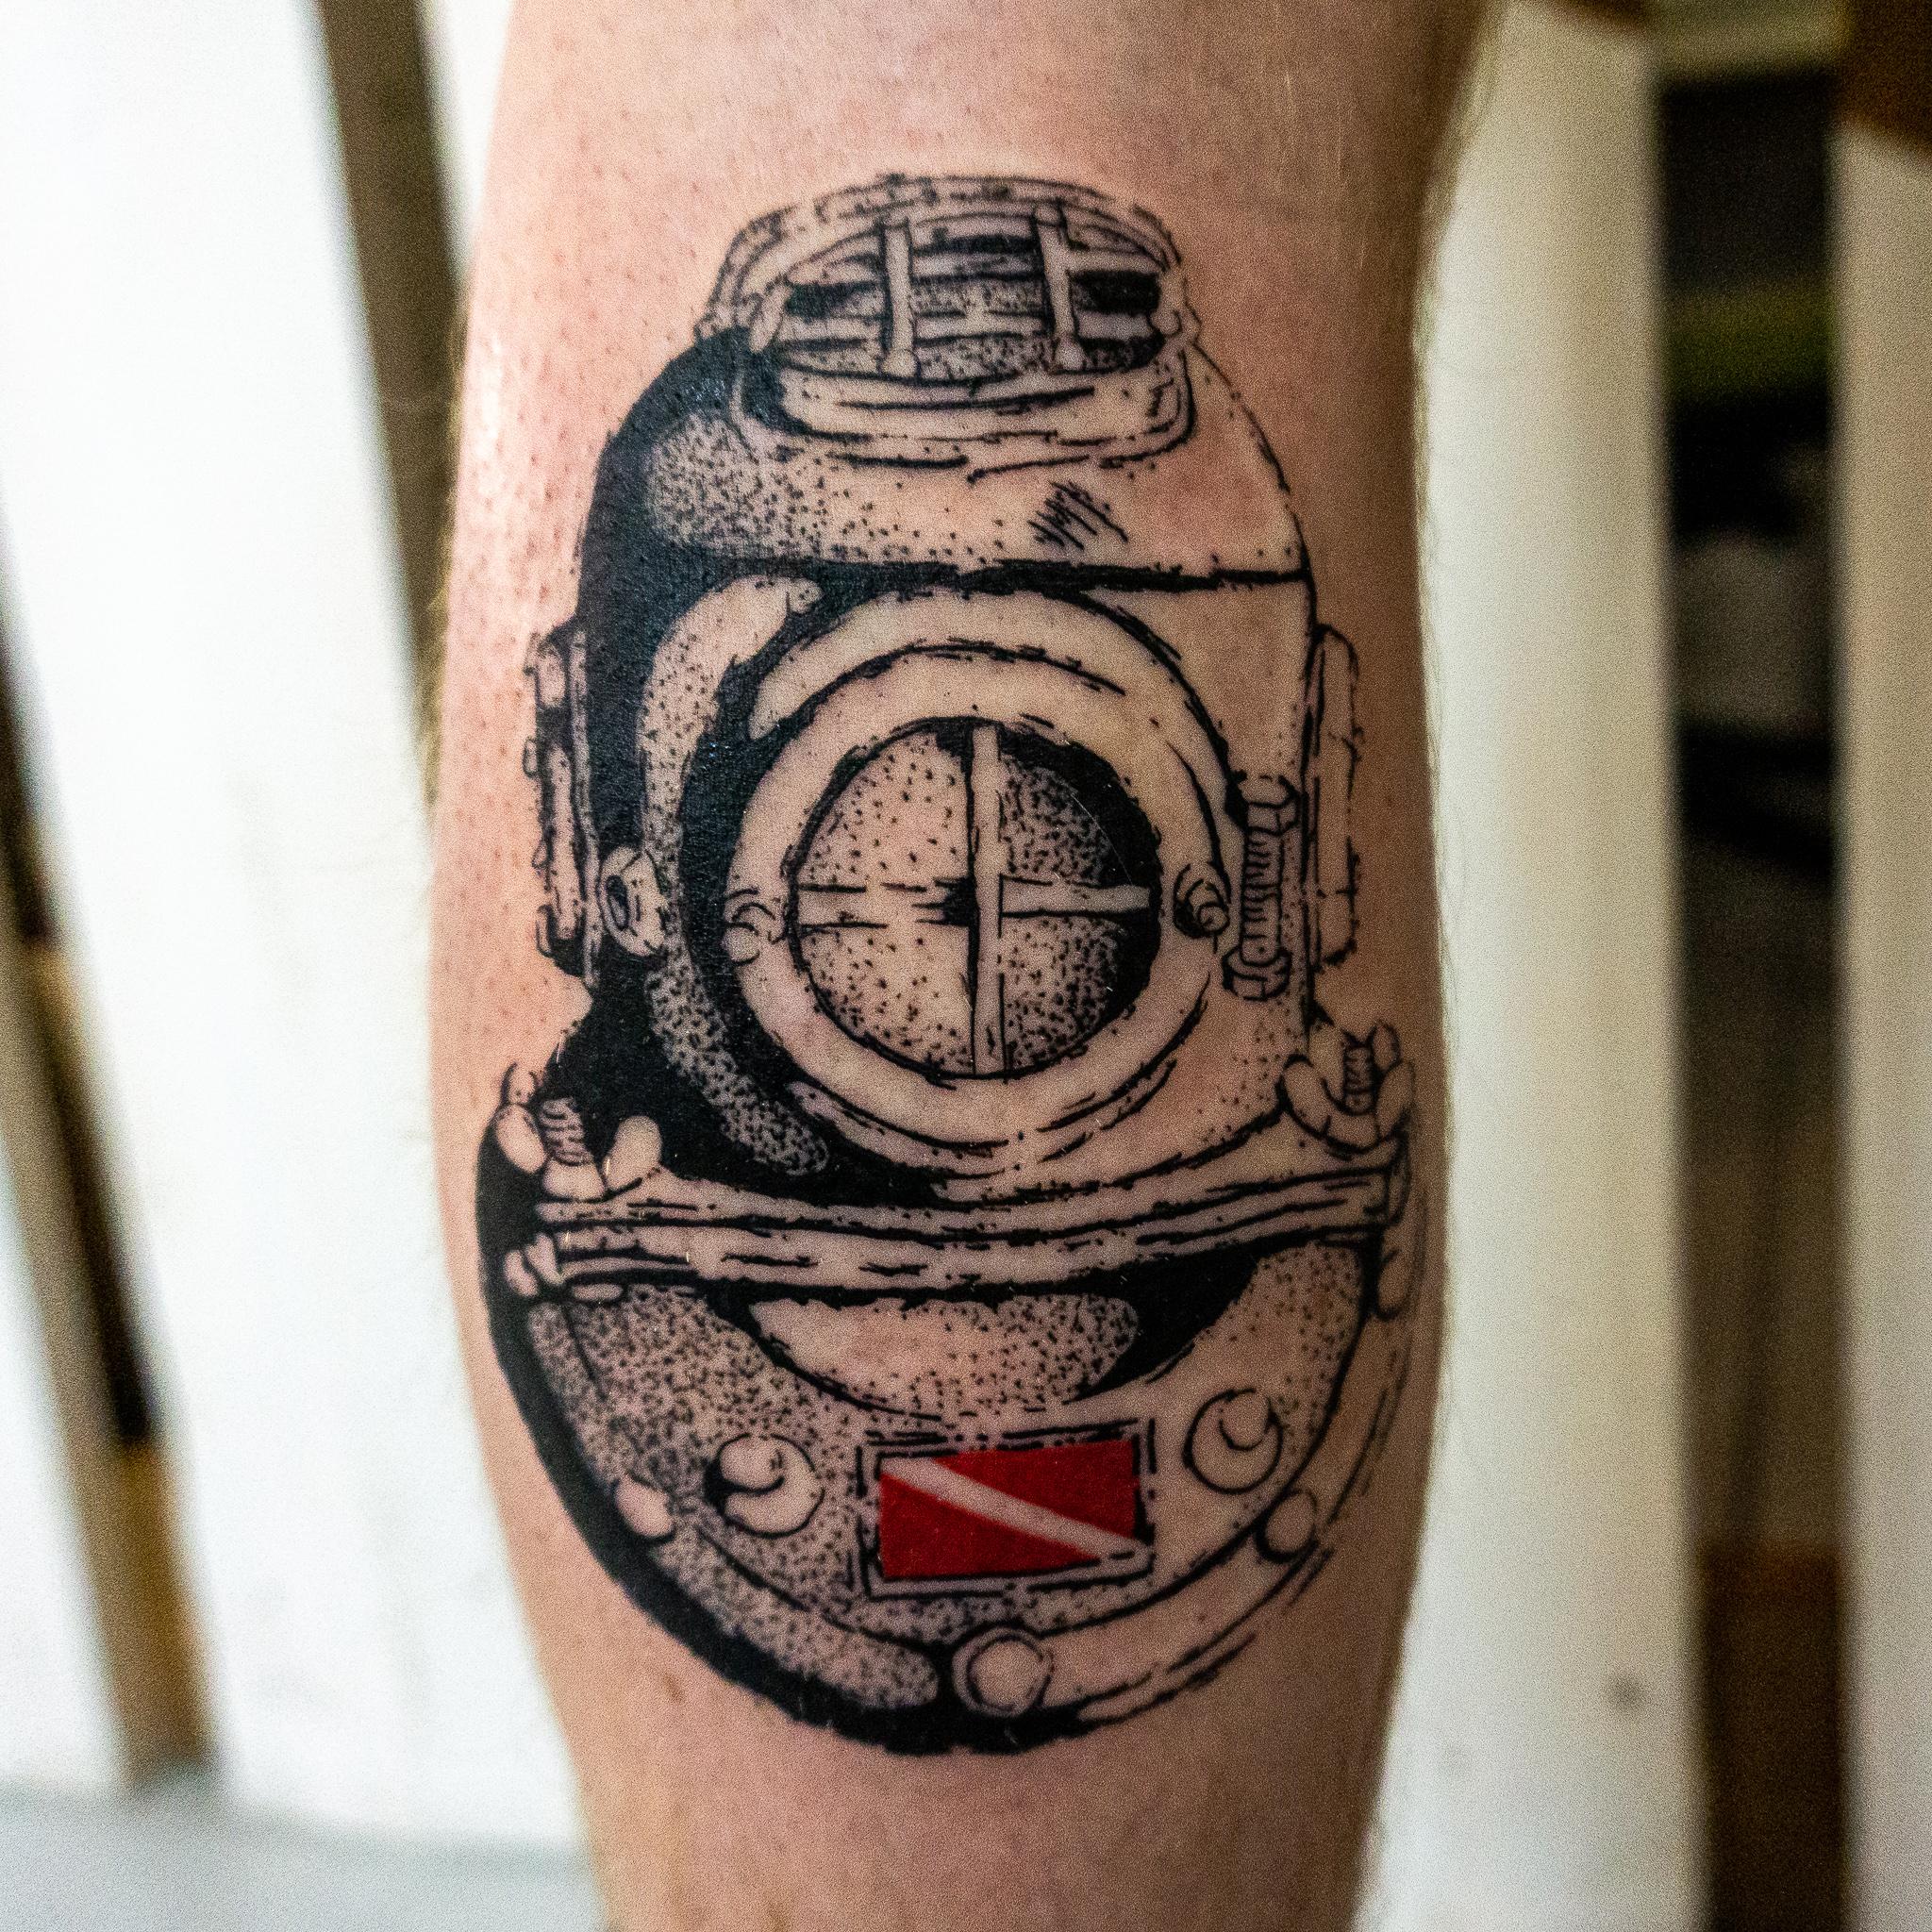 Inksearch tattoo Wolf